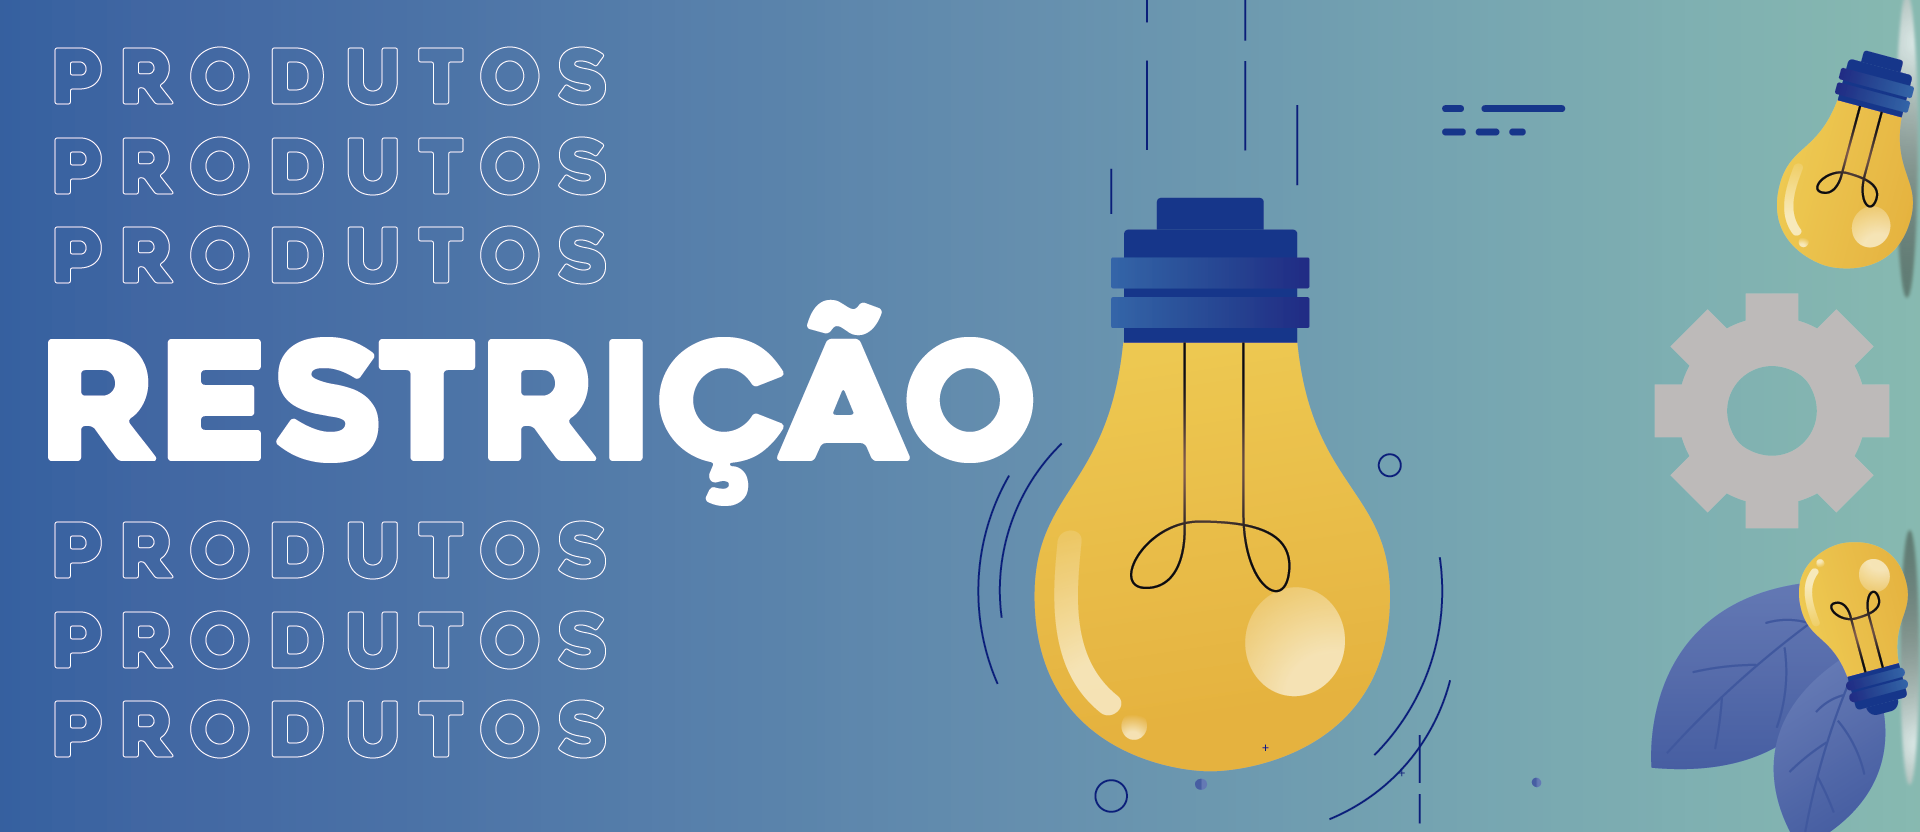 VENDEDOR MAGAZINE LUIZA VS PARCEIRO MAGALU